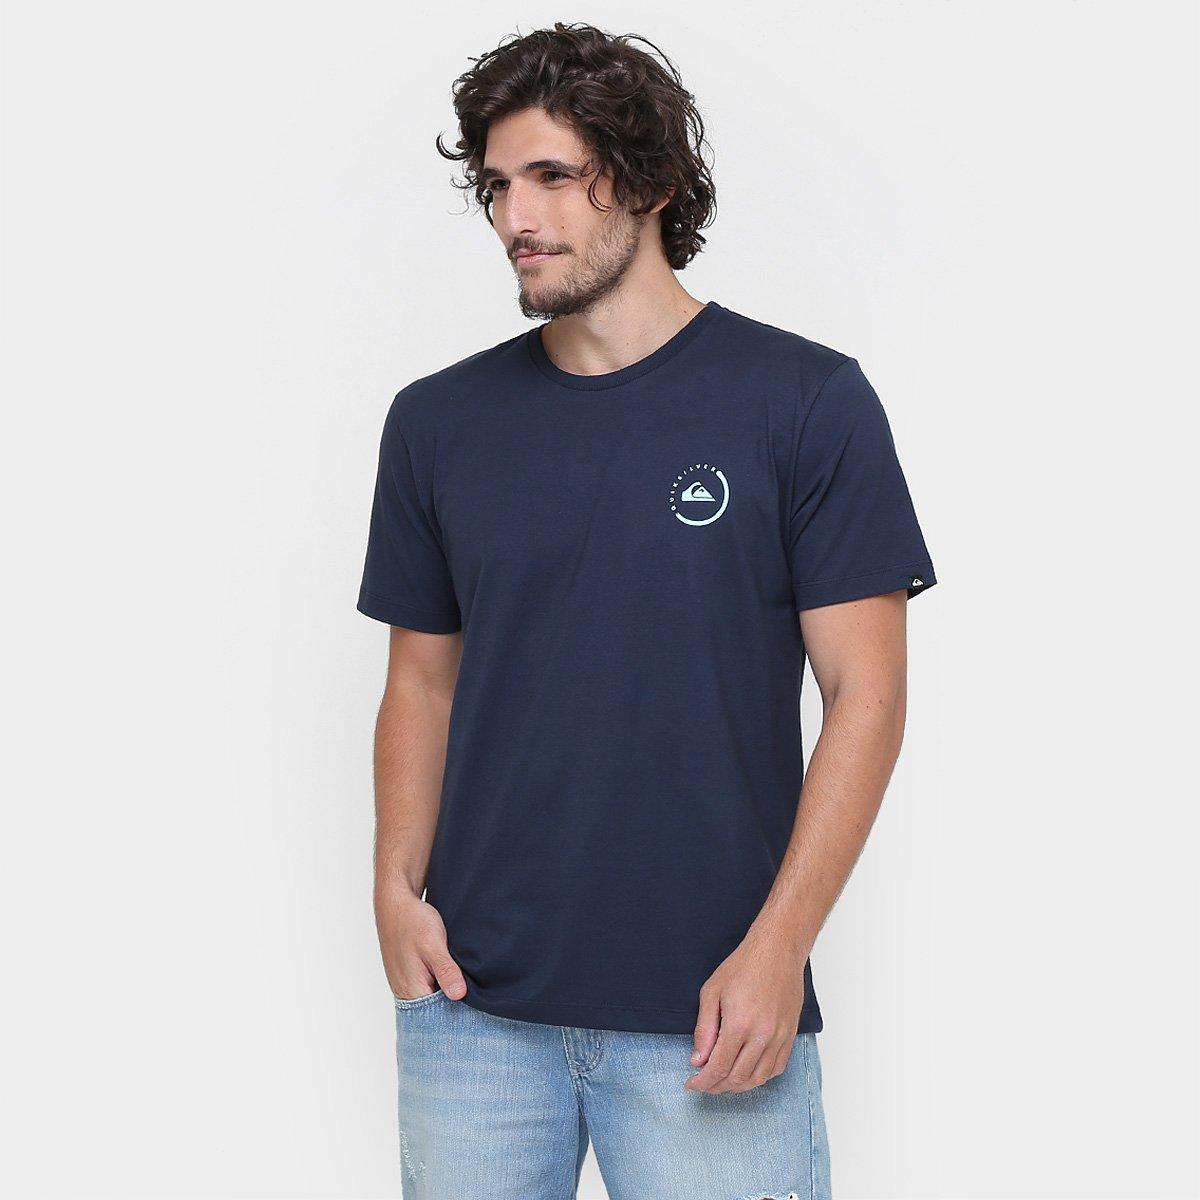 aaa7af260b26e Camiseta Quiksilver Básica Active Logo Plus - Marinho - Compre Agora ...